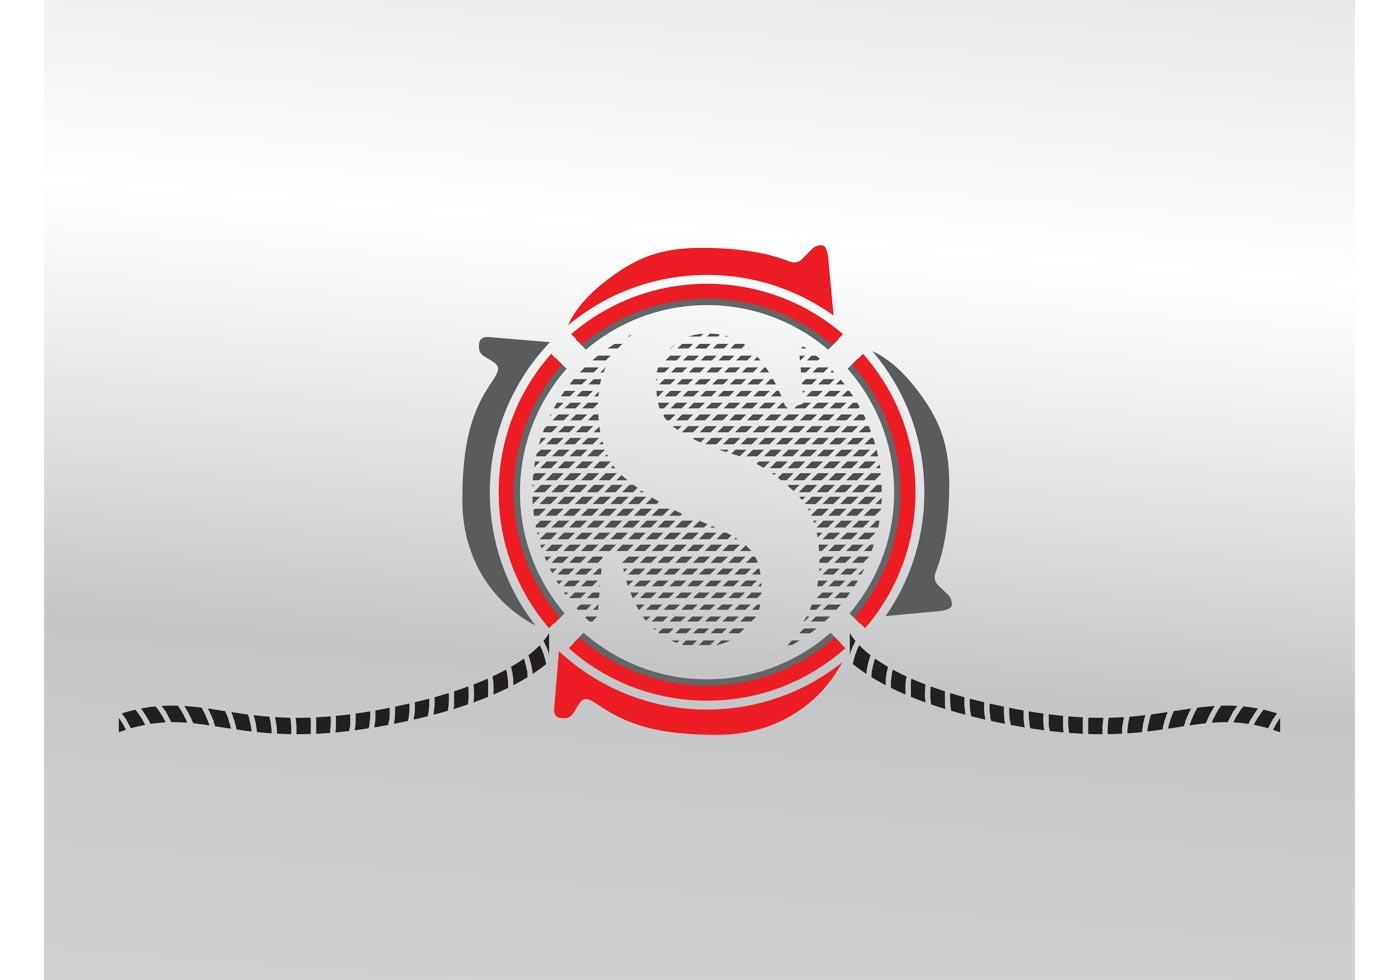 Letter s design download free vector art stock graphics images altavistaventures Image collections